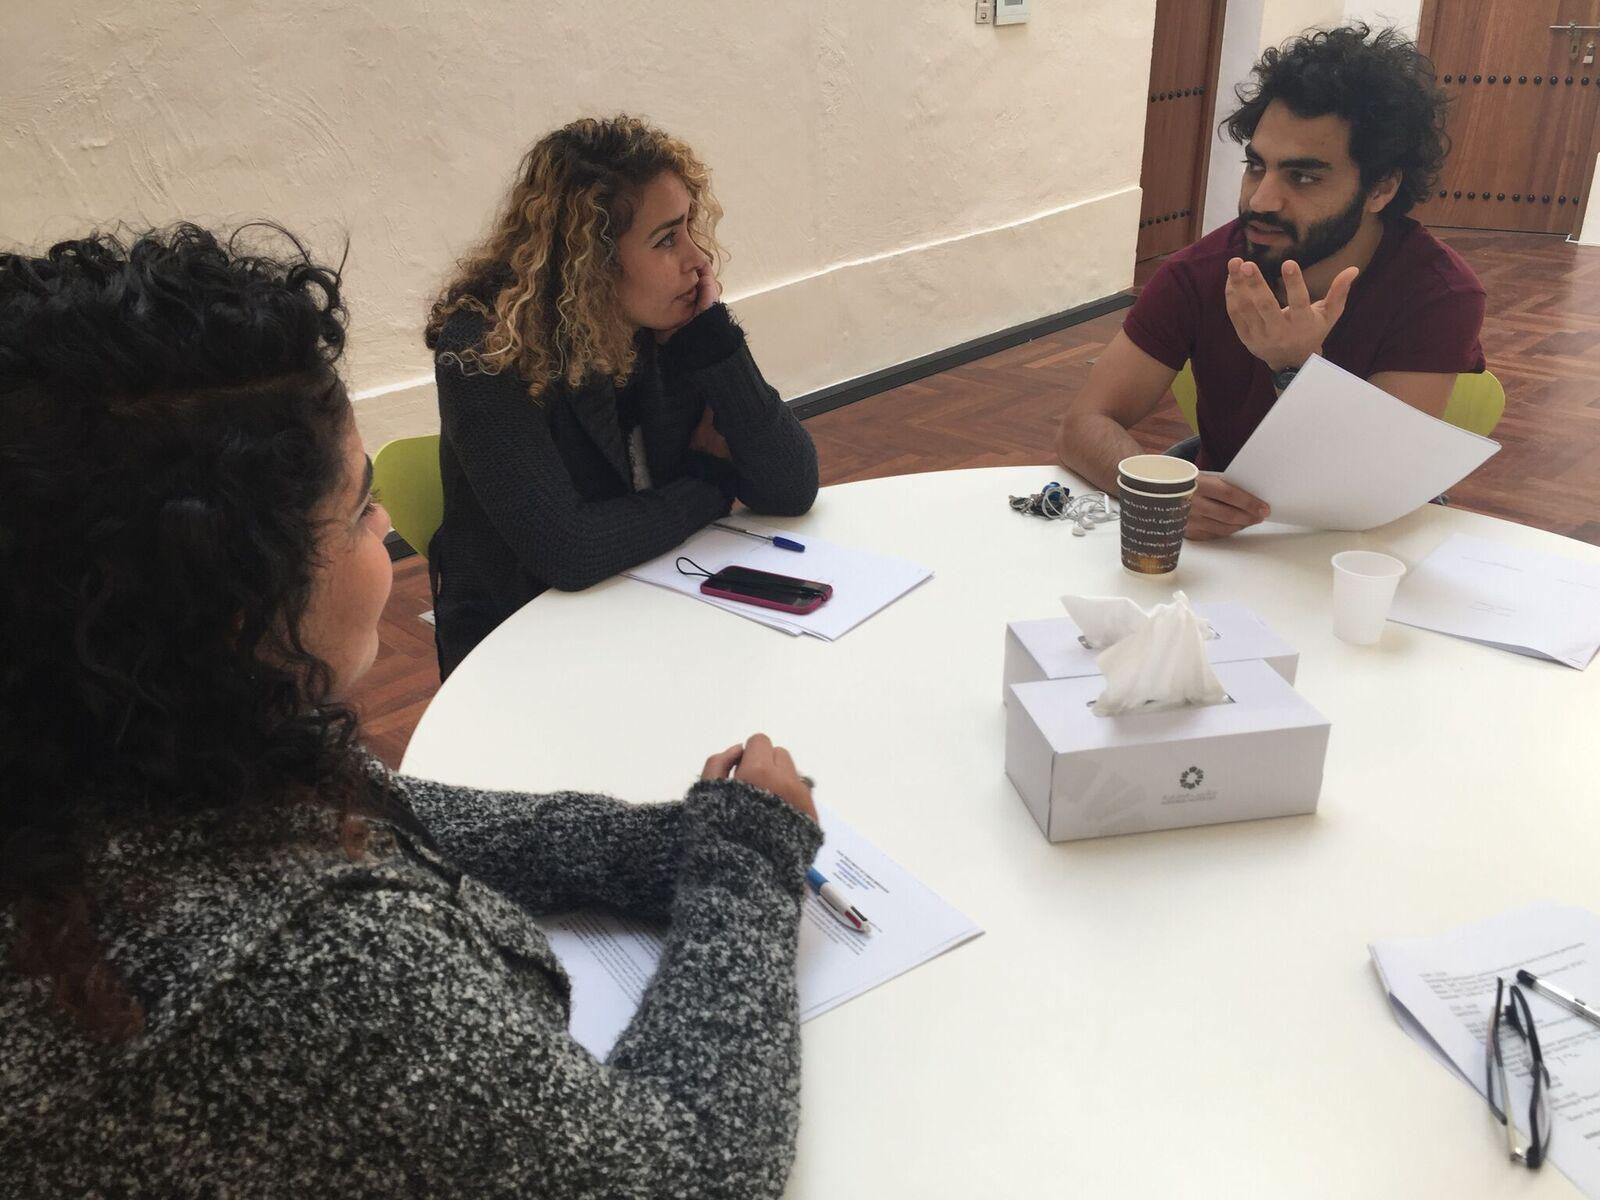 The Short Screenwriting Lab